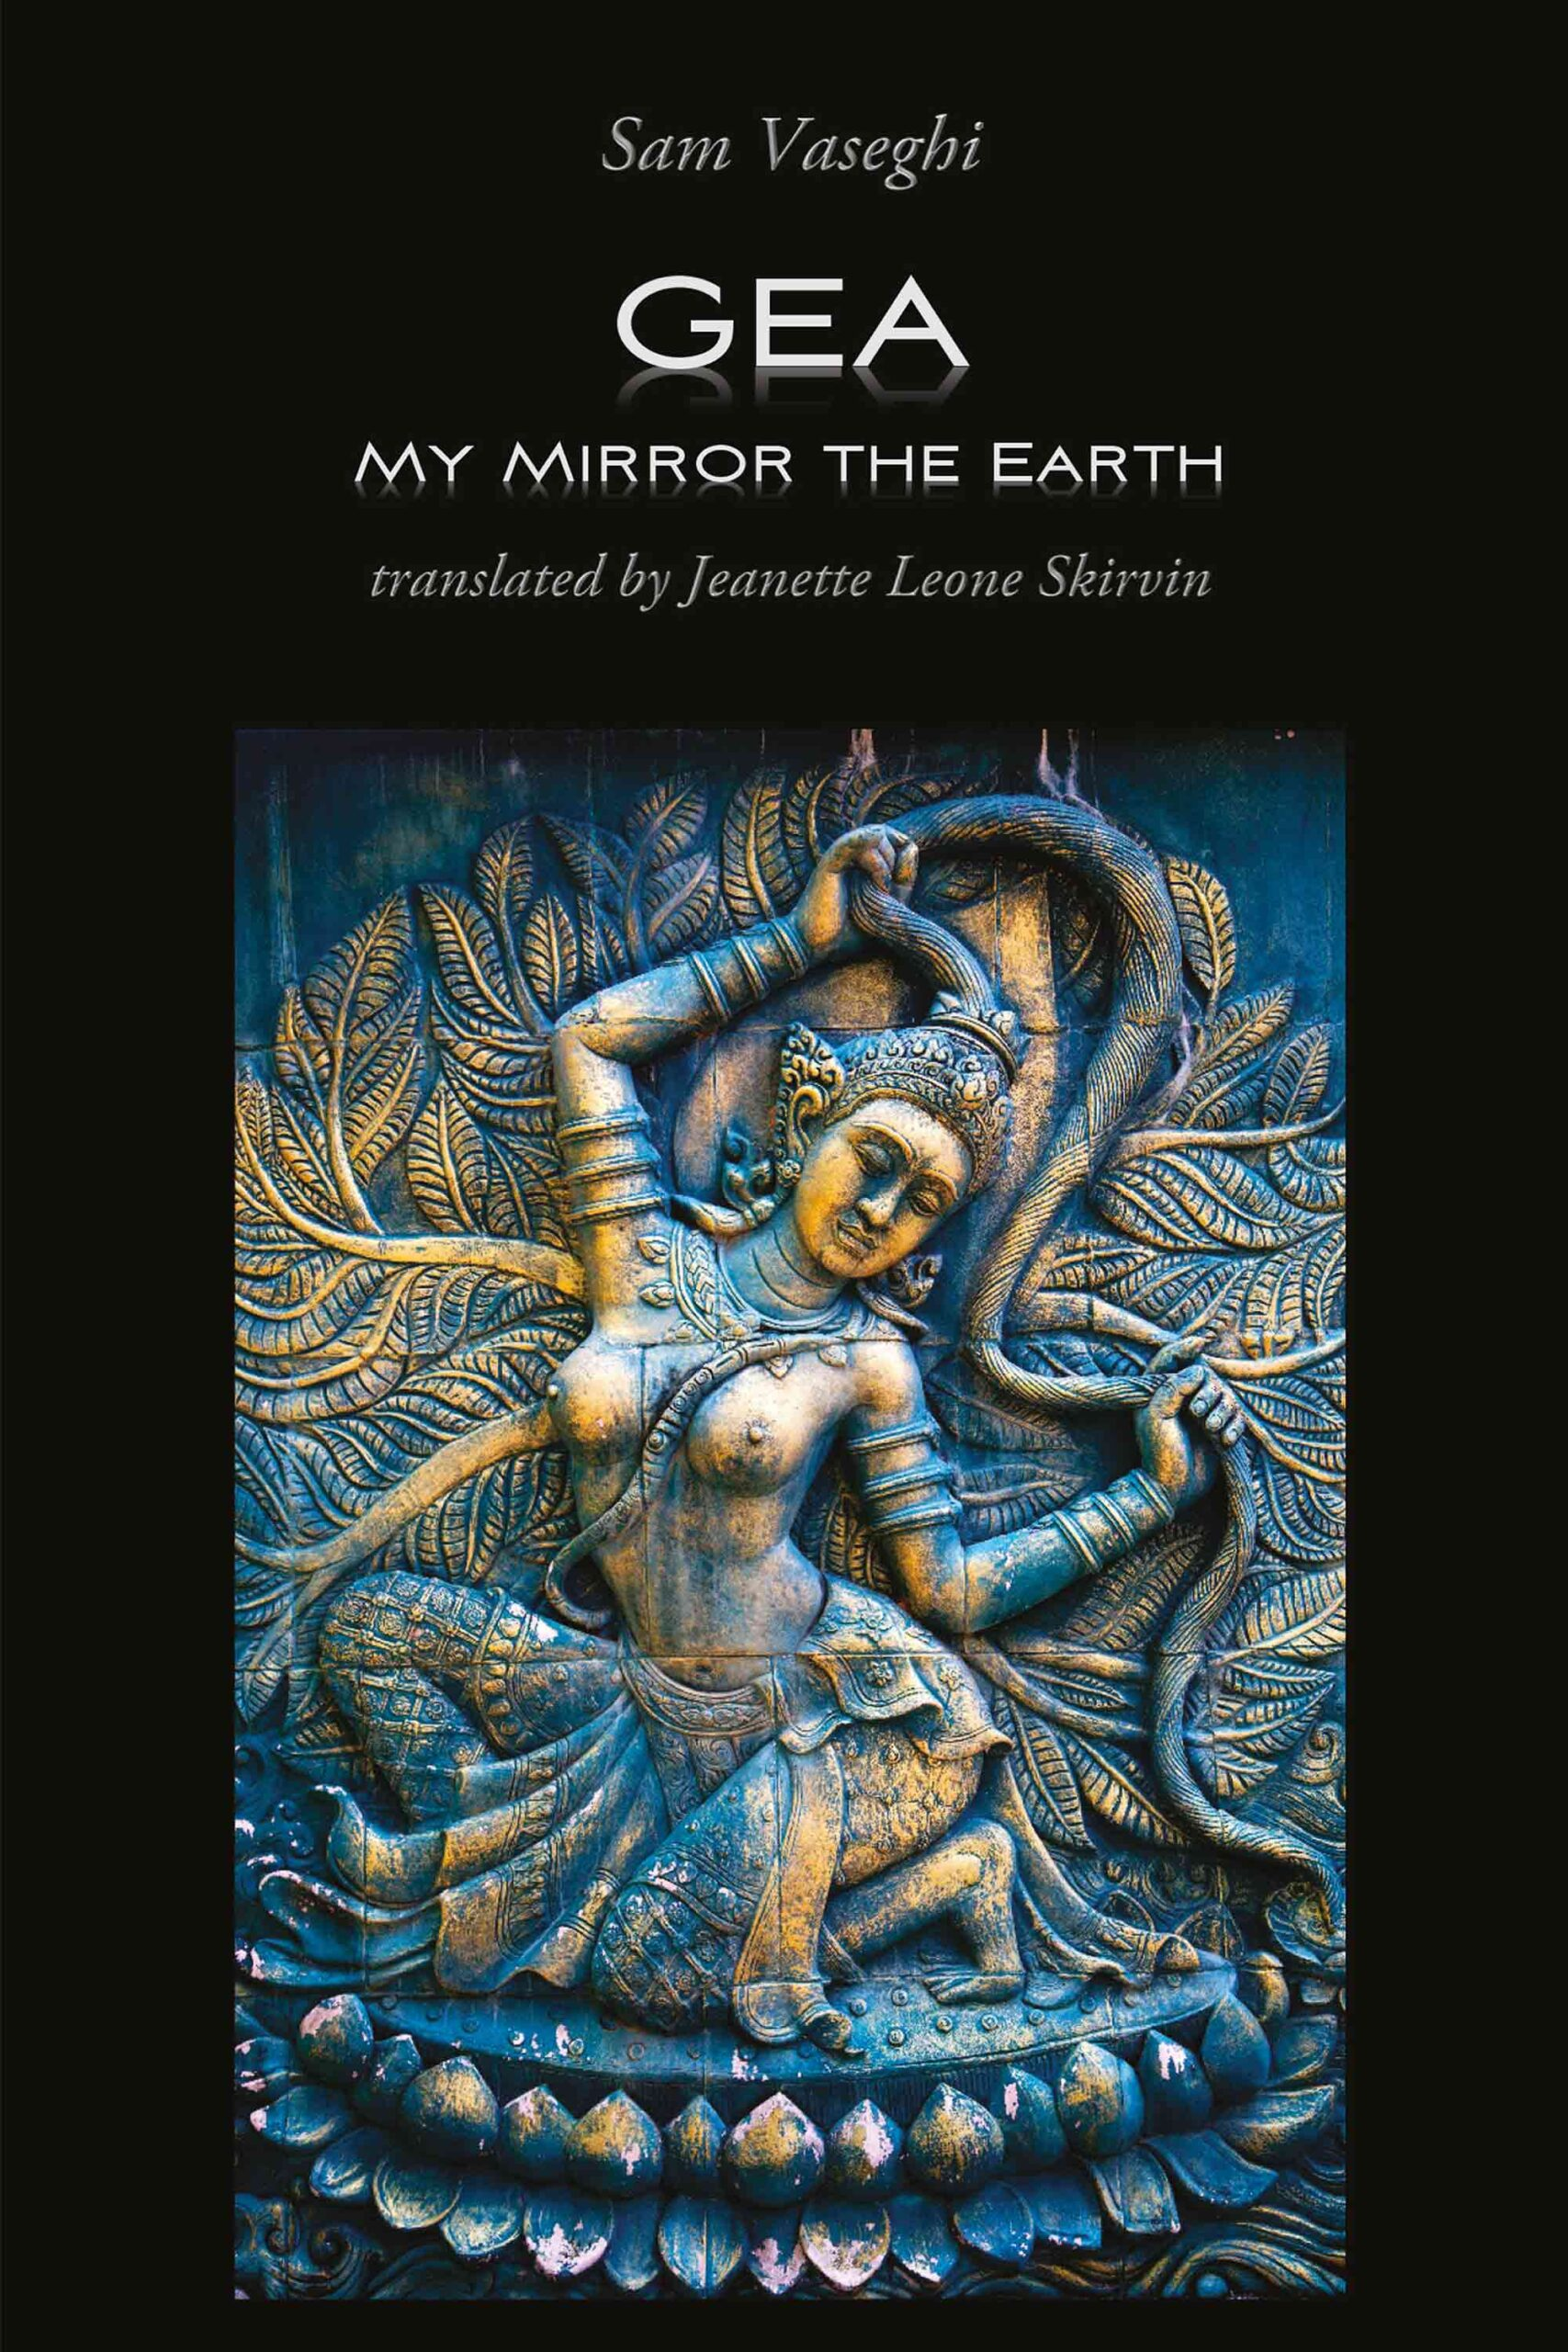 GEA – My Mirror the Earth